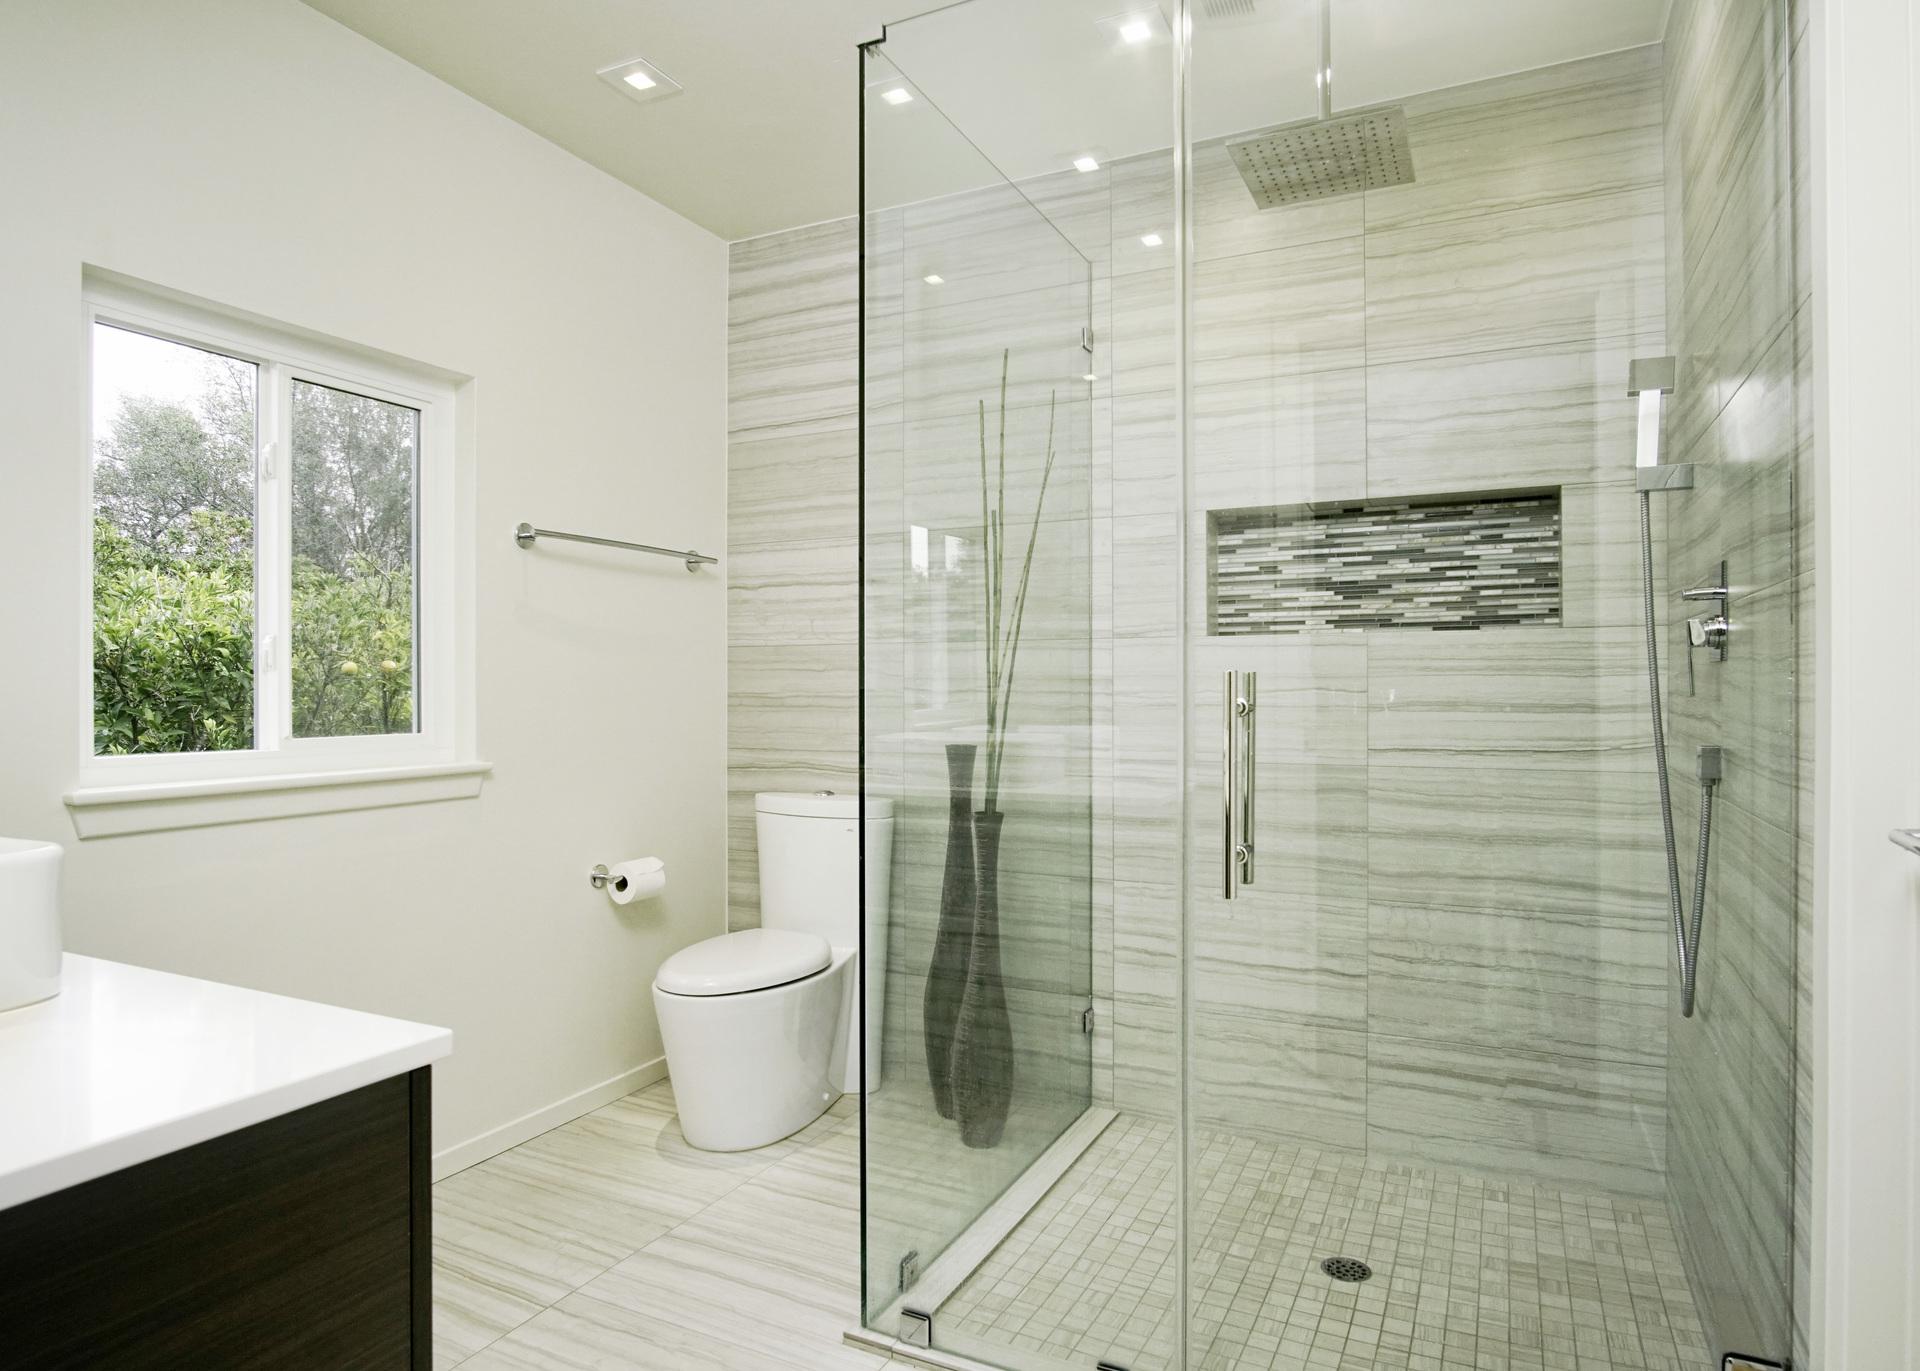 Case Study – Bathrooms – General Construction, Remodeling & Design